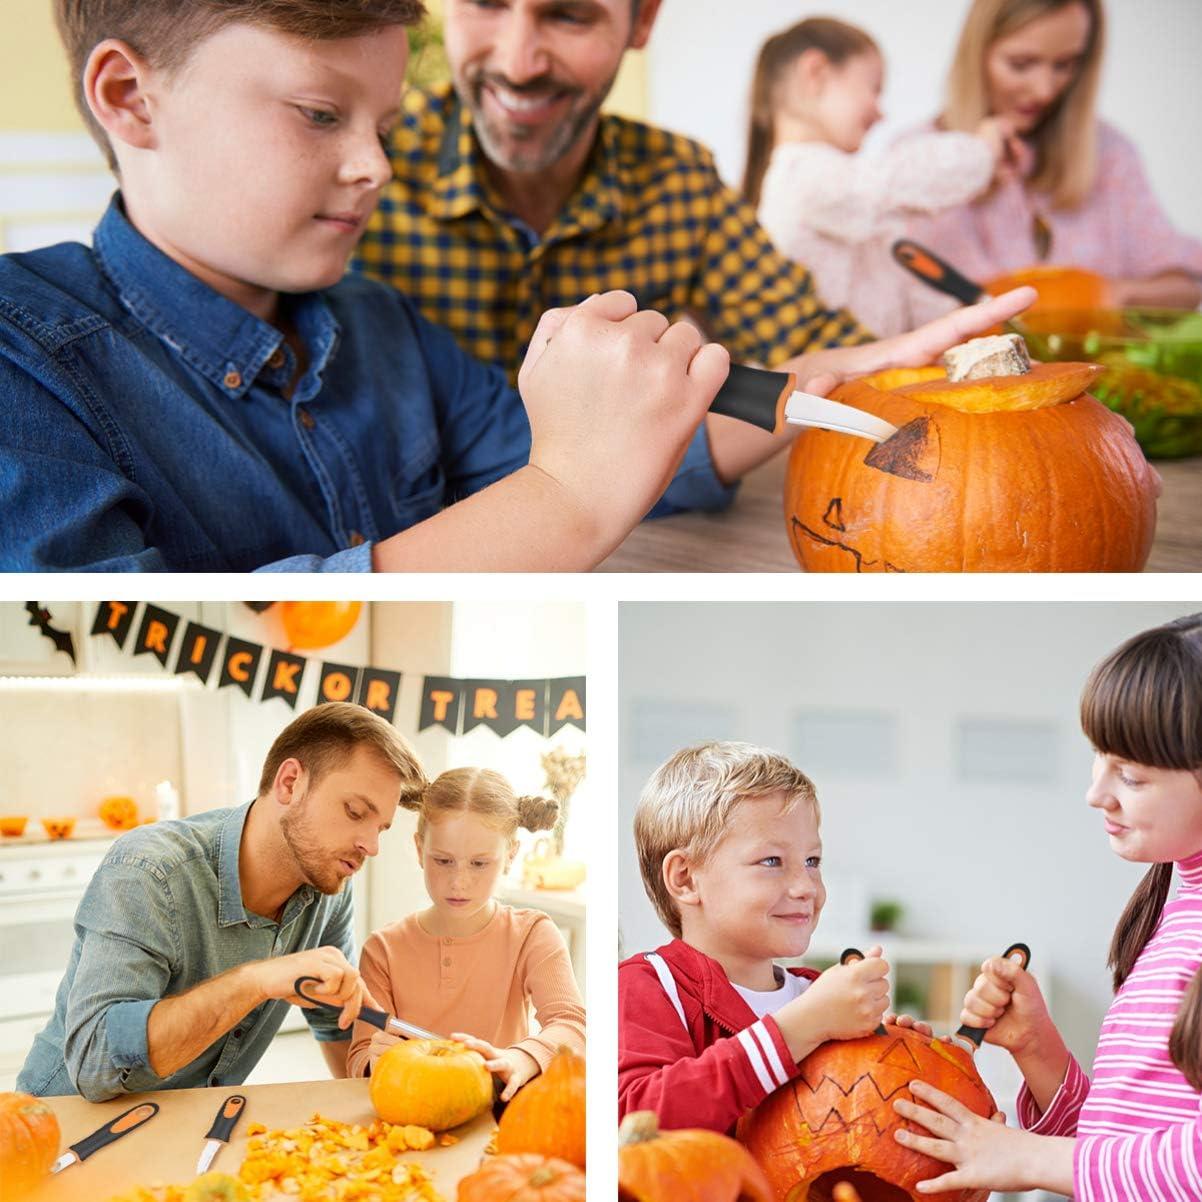 Halloween Pumpkin Carving Set Pumpkin Cutting Supplies Stainless Steel Jack-O-Lantern Carving Tools 9PCS